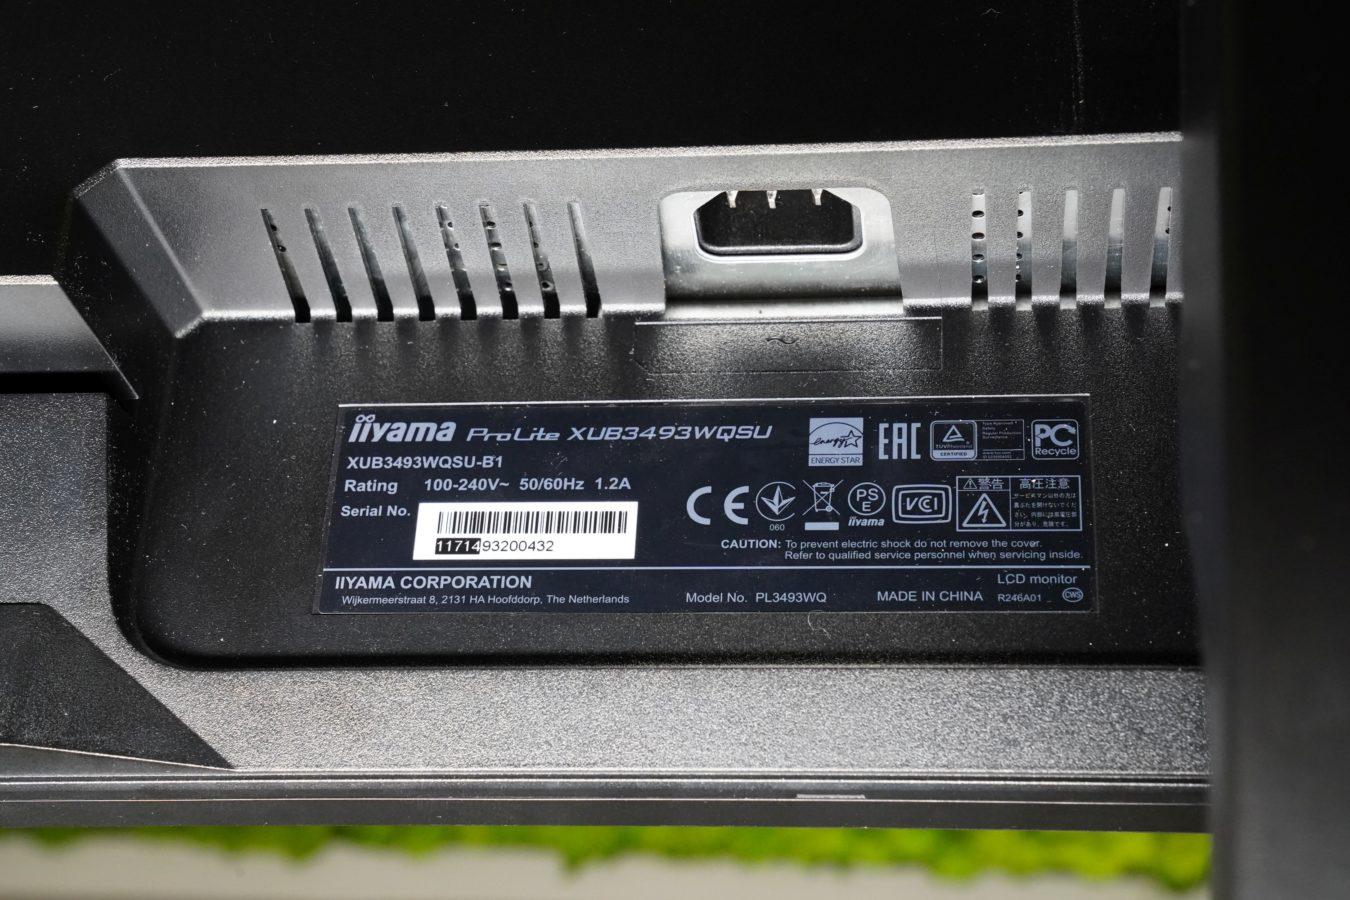 Recenzja iiyama ProLite XUB3493WQSU - drogi, ale fajny monitor! 31 iiyama ProLite XUB3493WQSU